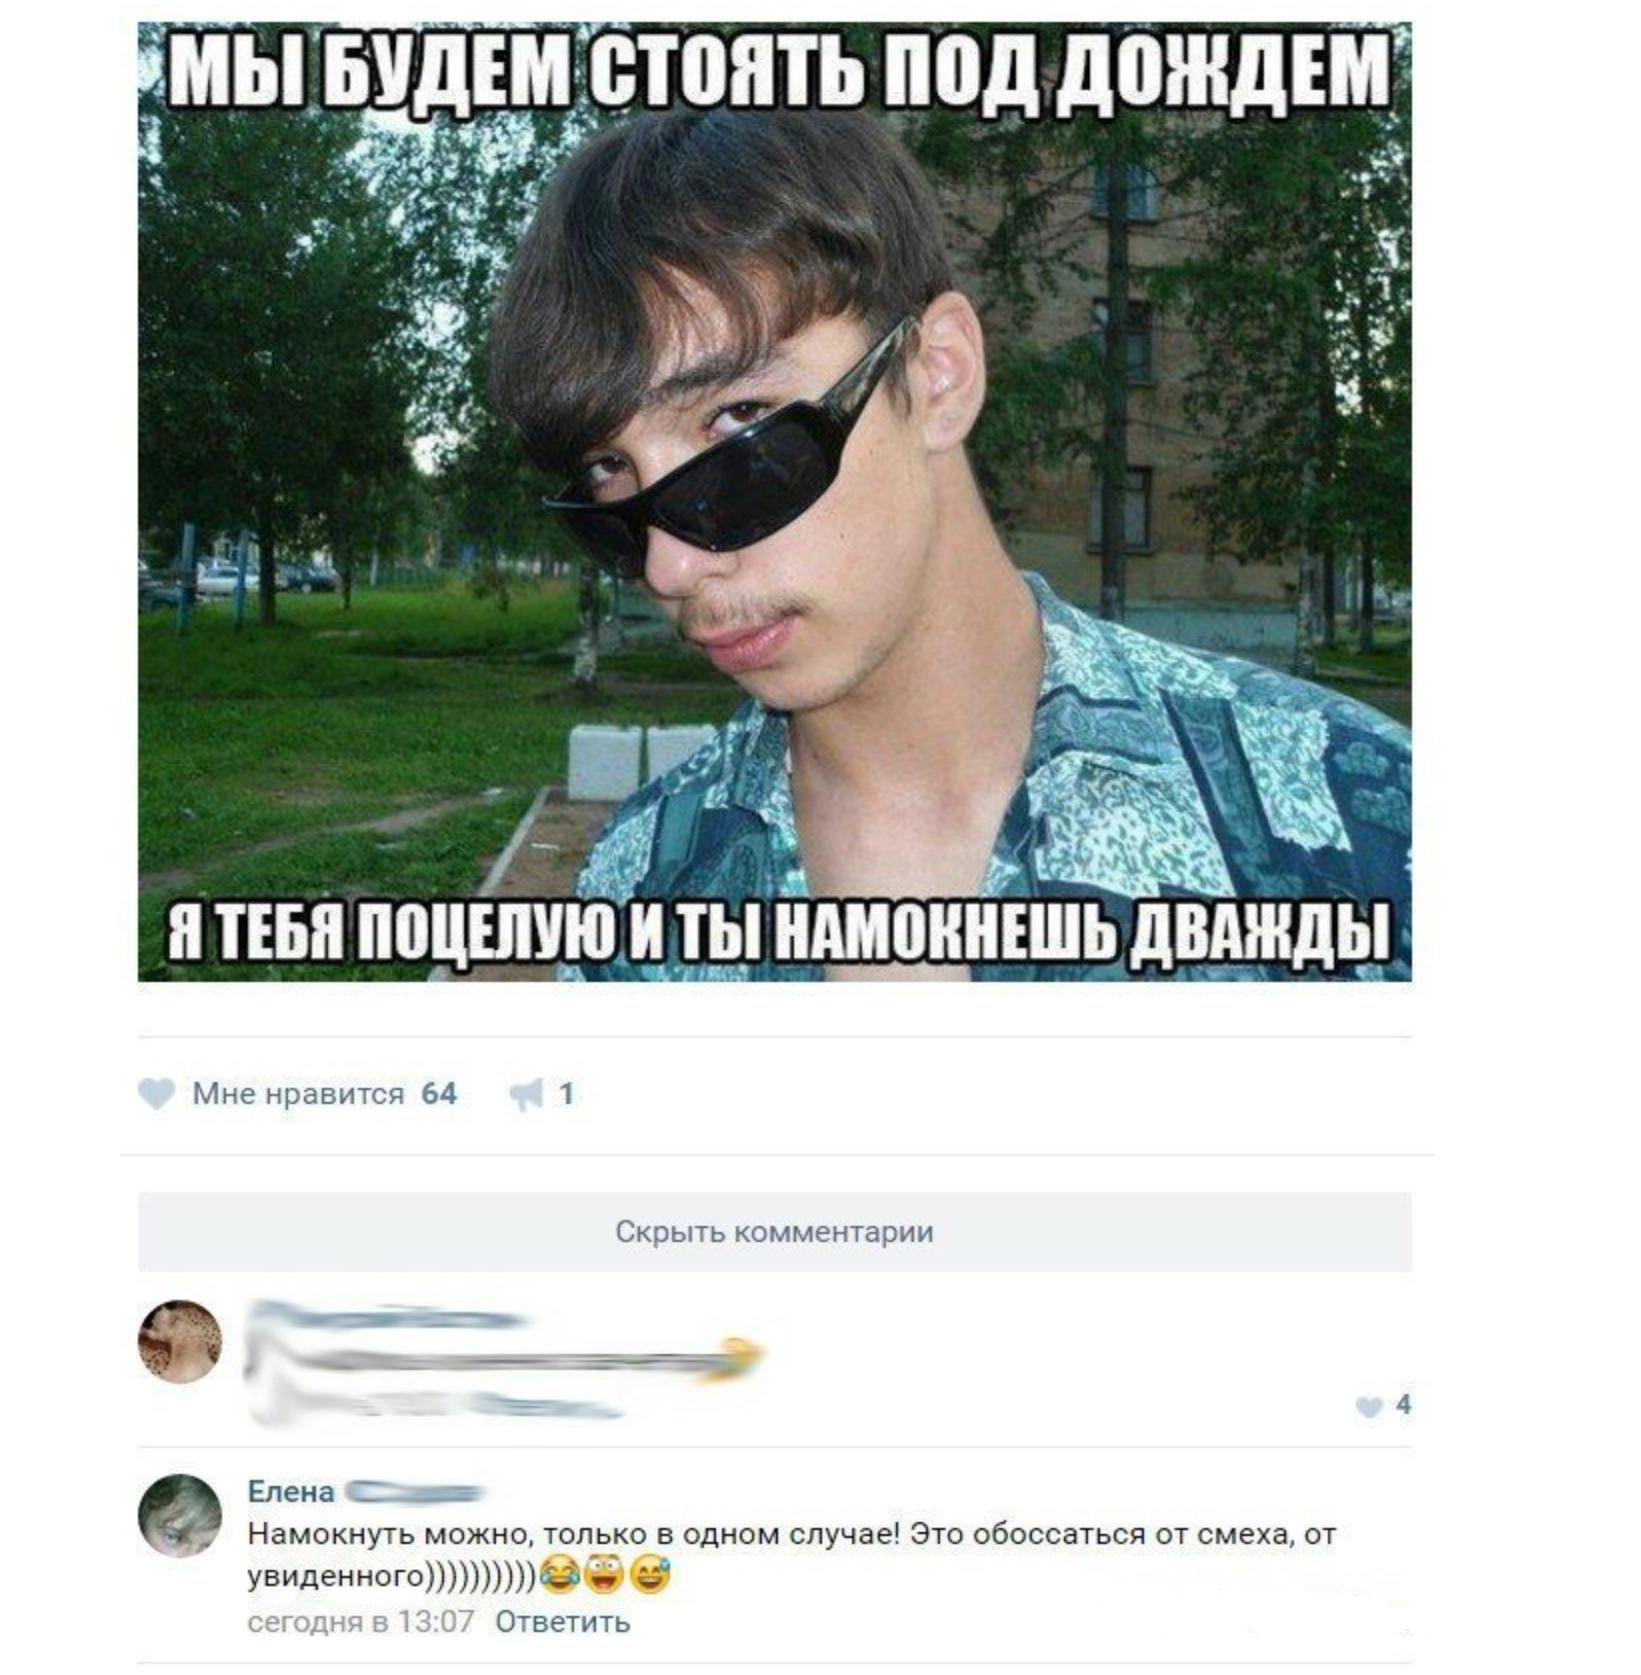 https://i3.imageban.ru/out/2019/04/11/dccd78c78849ecbd0d086f1ac47bbfe9.jpg